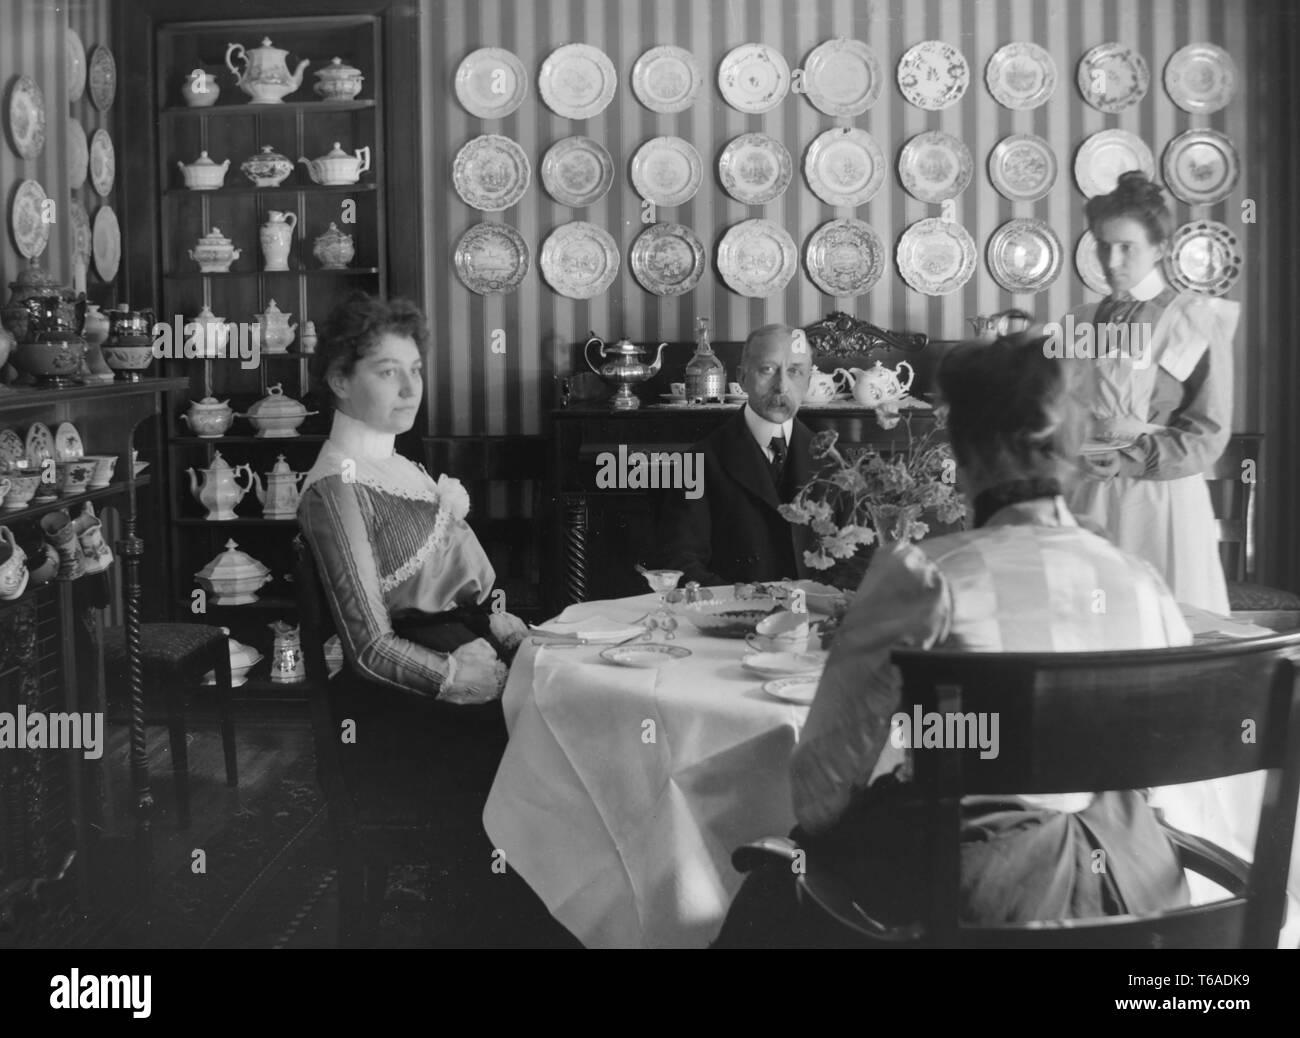 Maid Victorian Fotos e Imágenes de stock Alamy